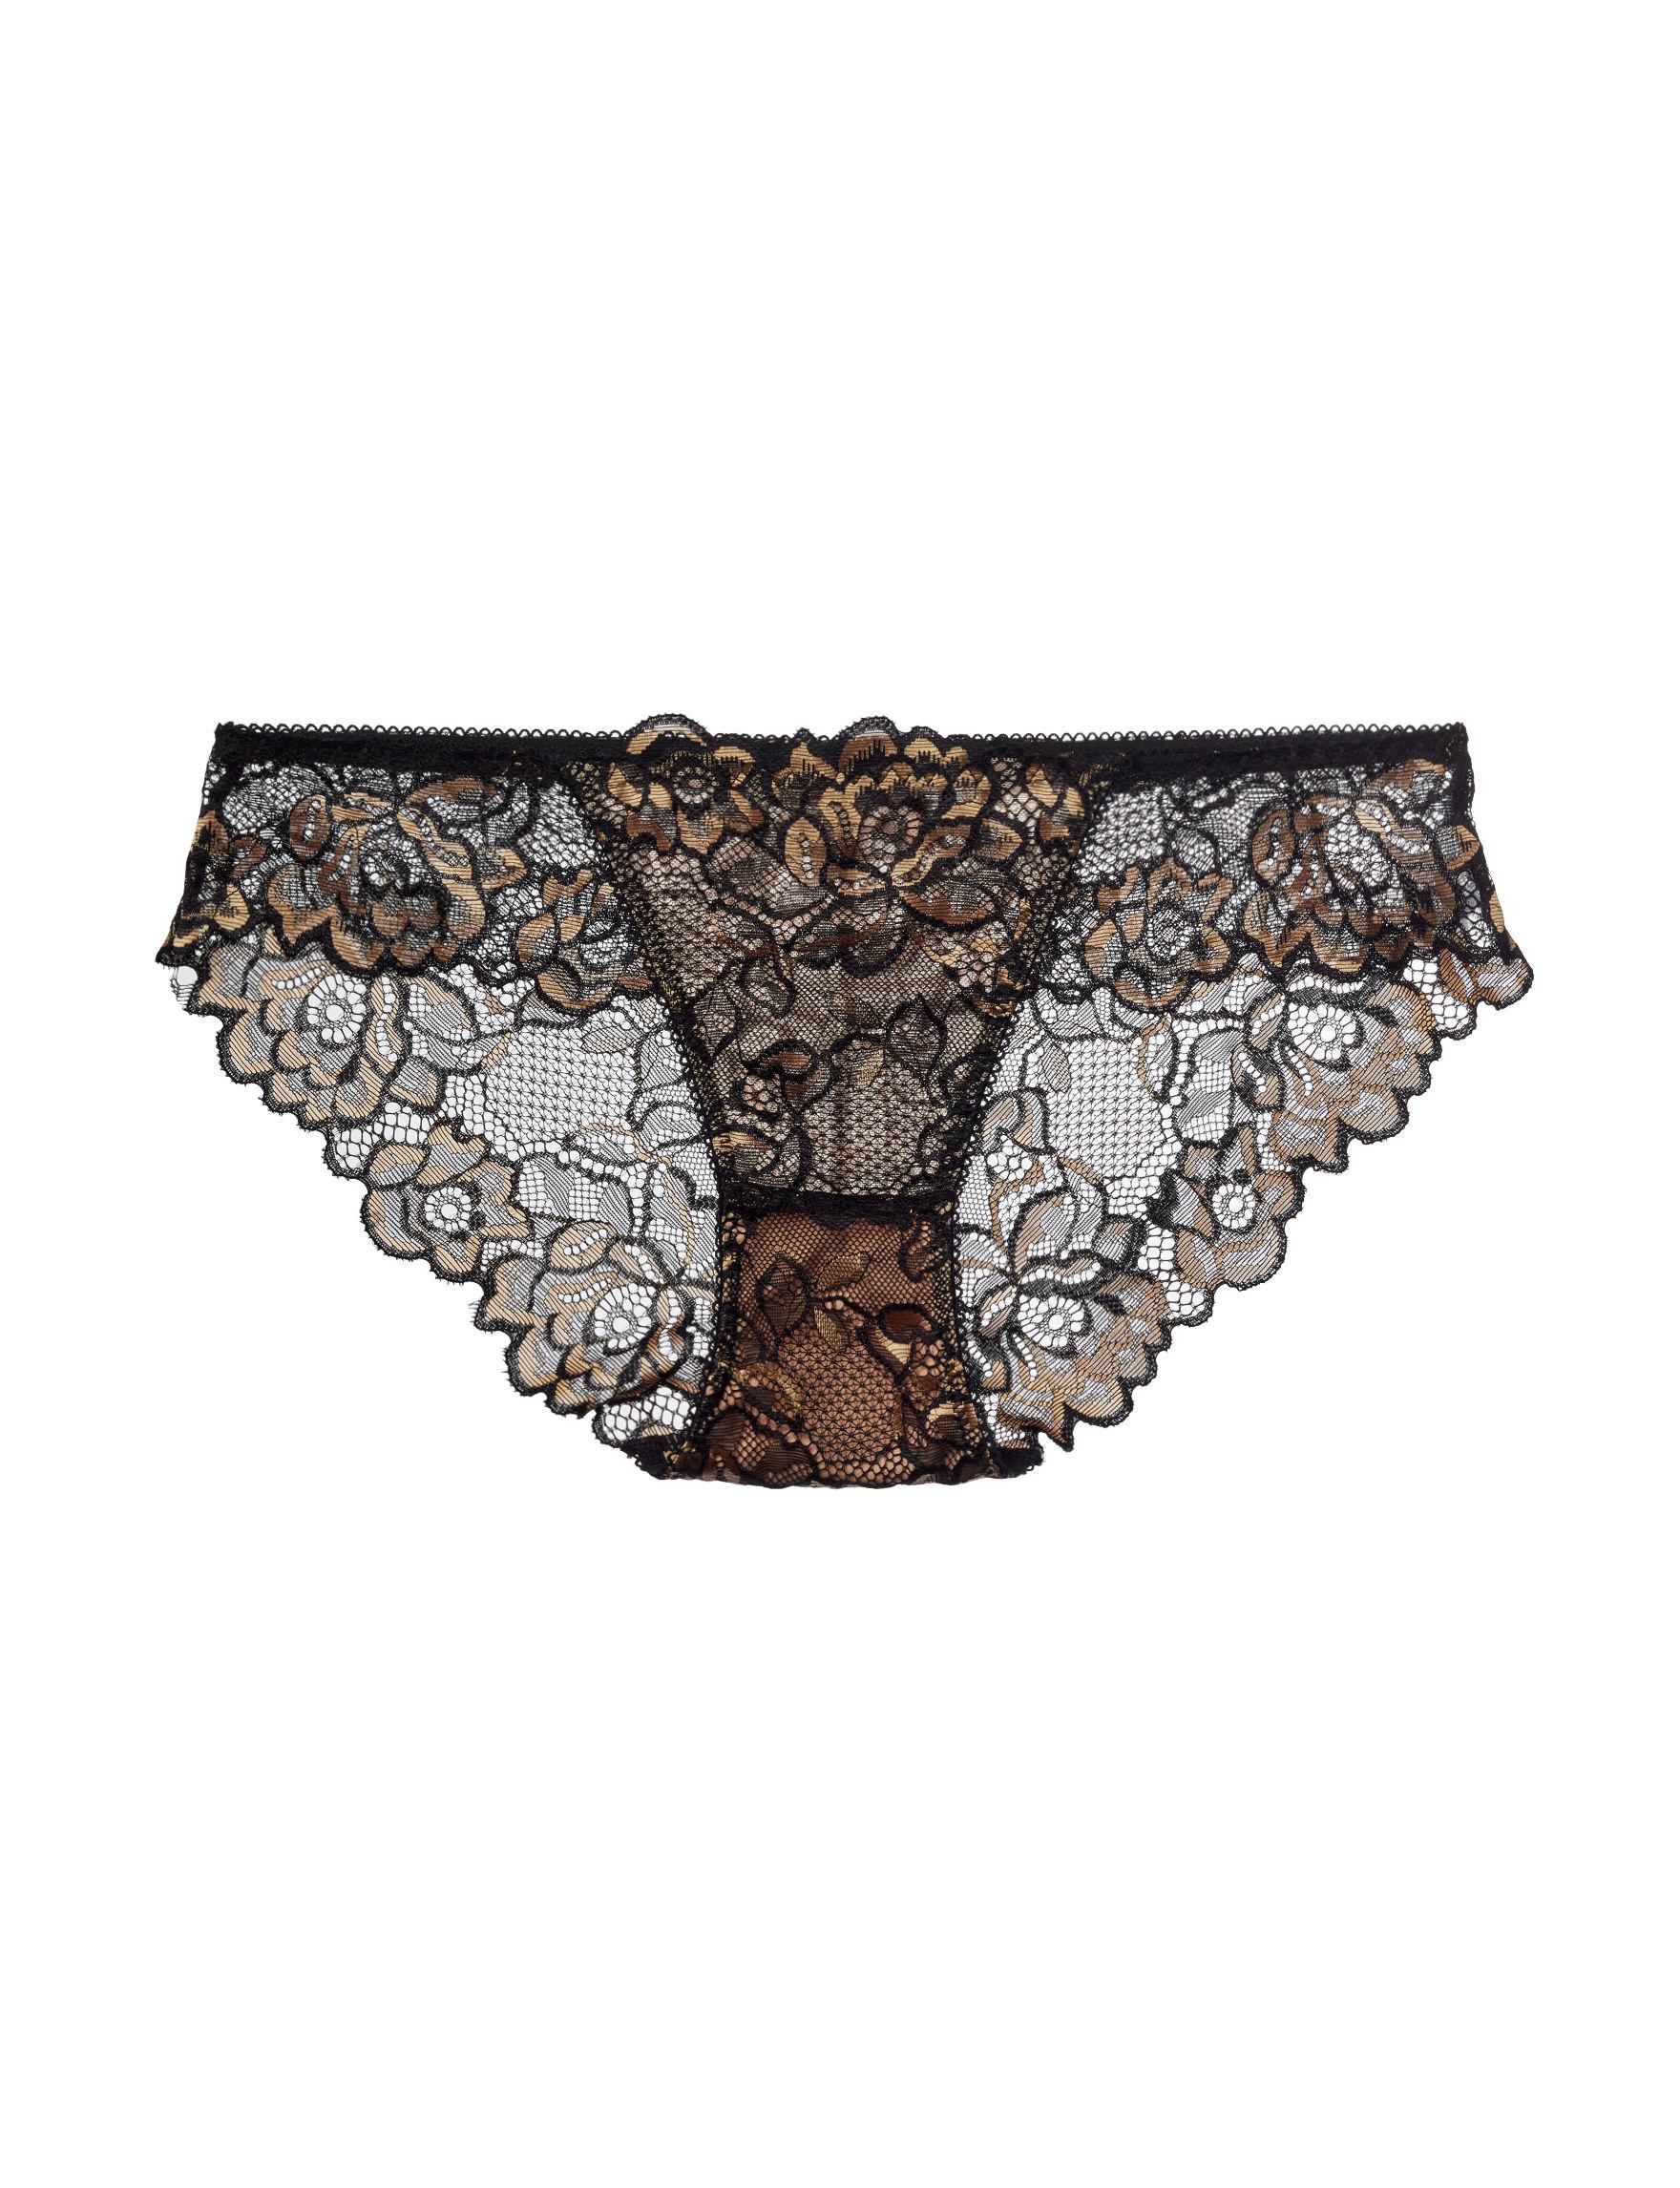 Rene Rofe Black Panties Bikini